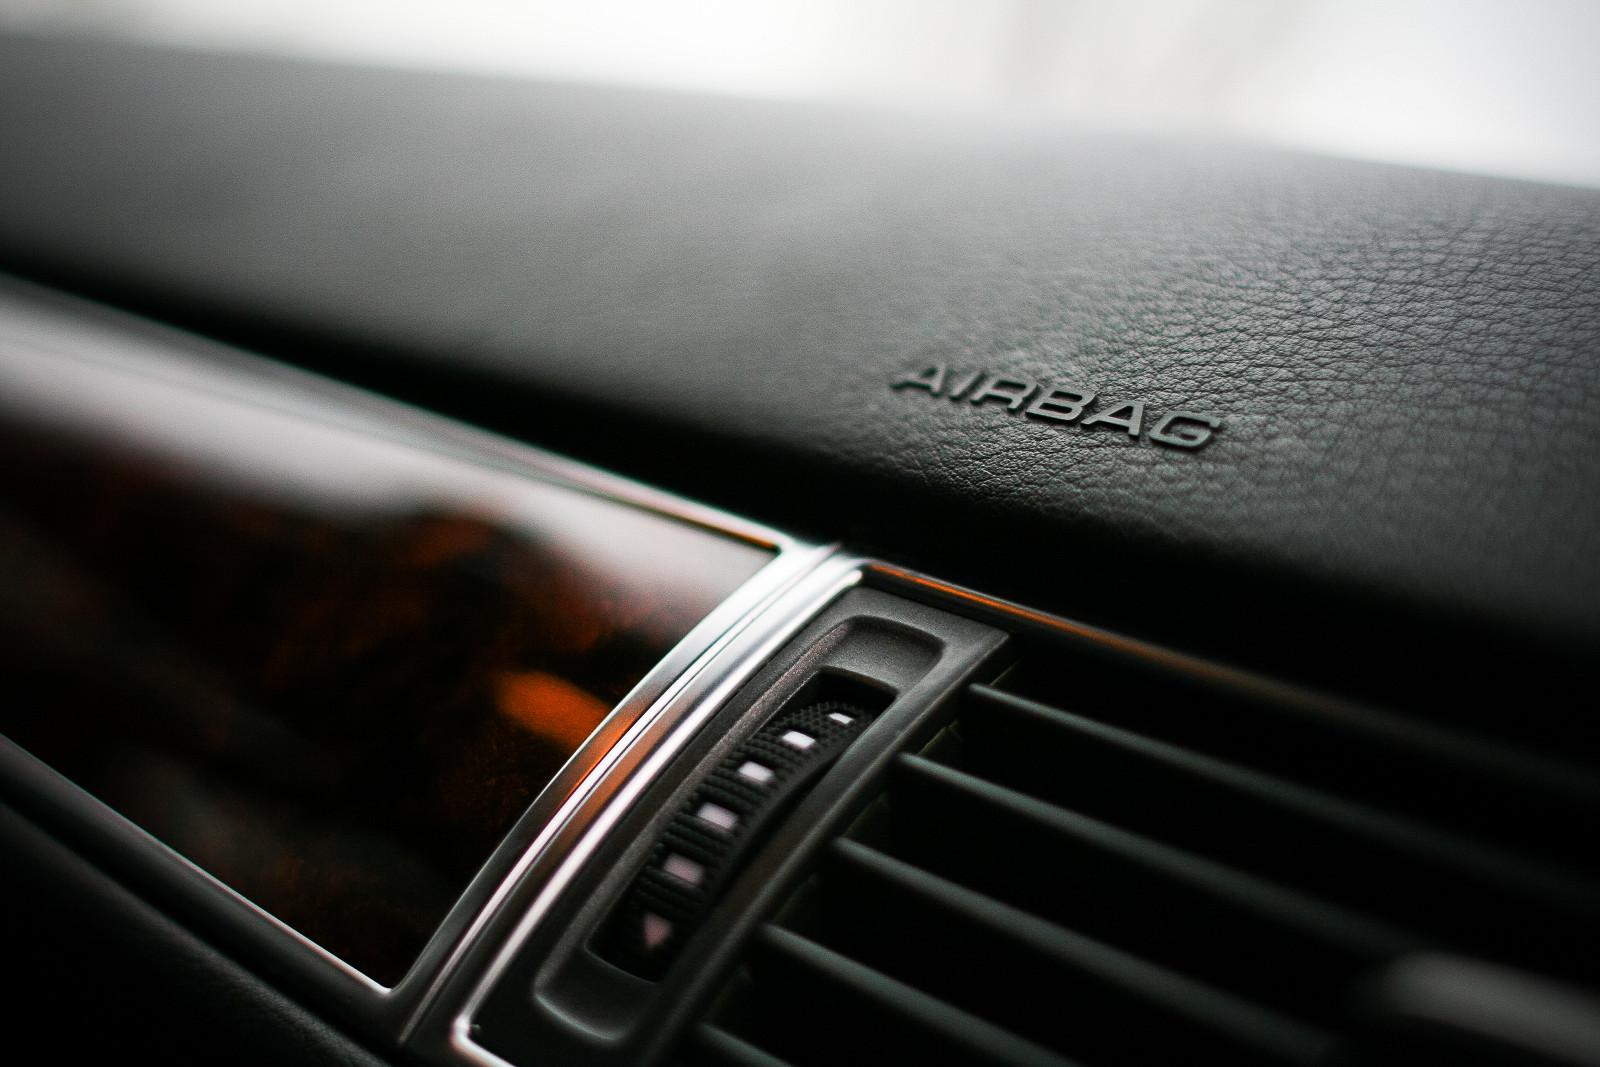 airbag-mark-on-a-dashboard-picjumbo-com.jpg [4.74 MB]